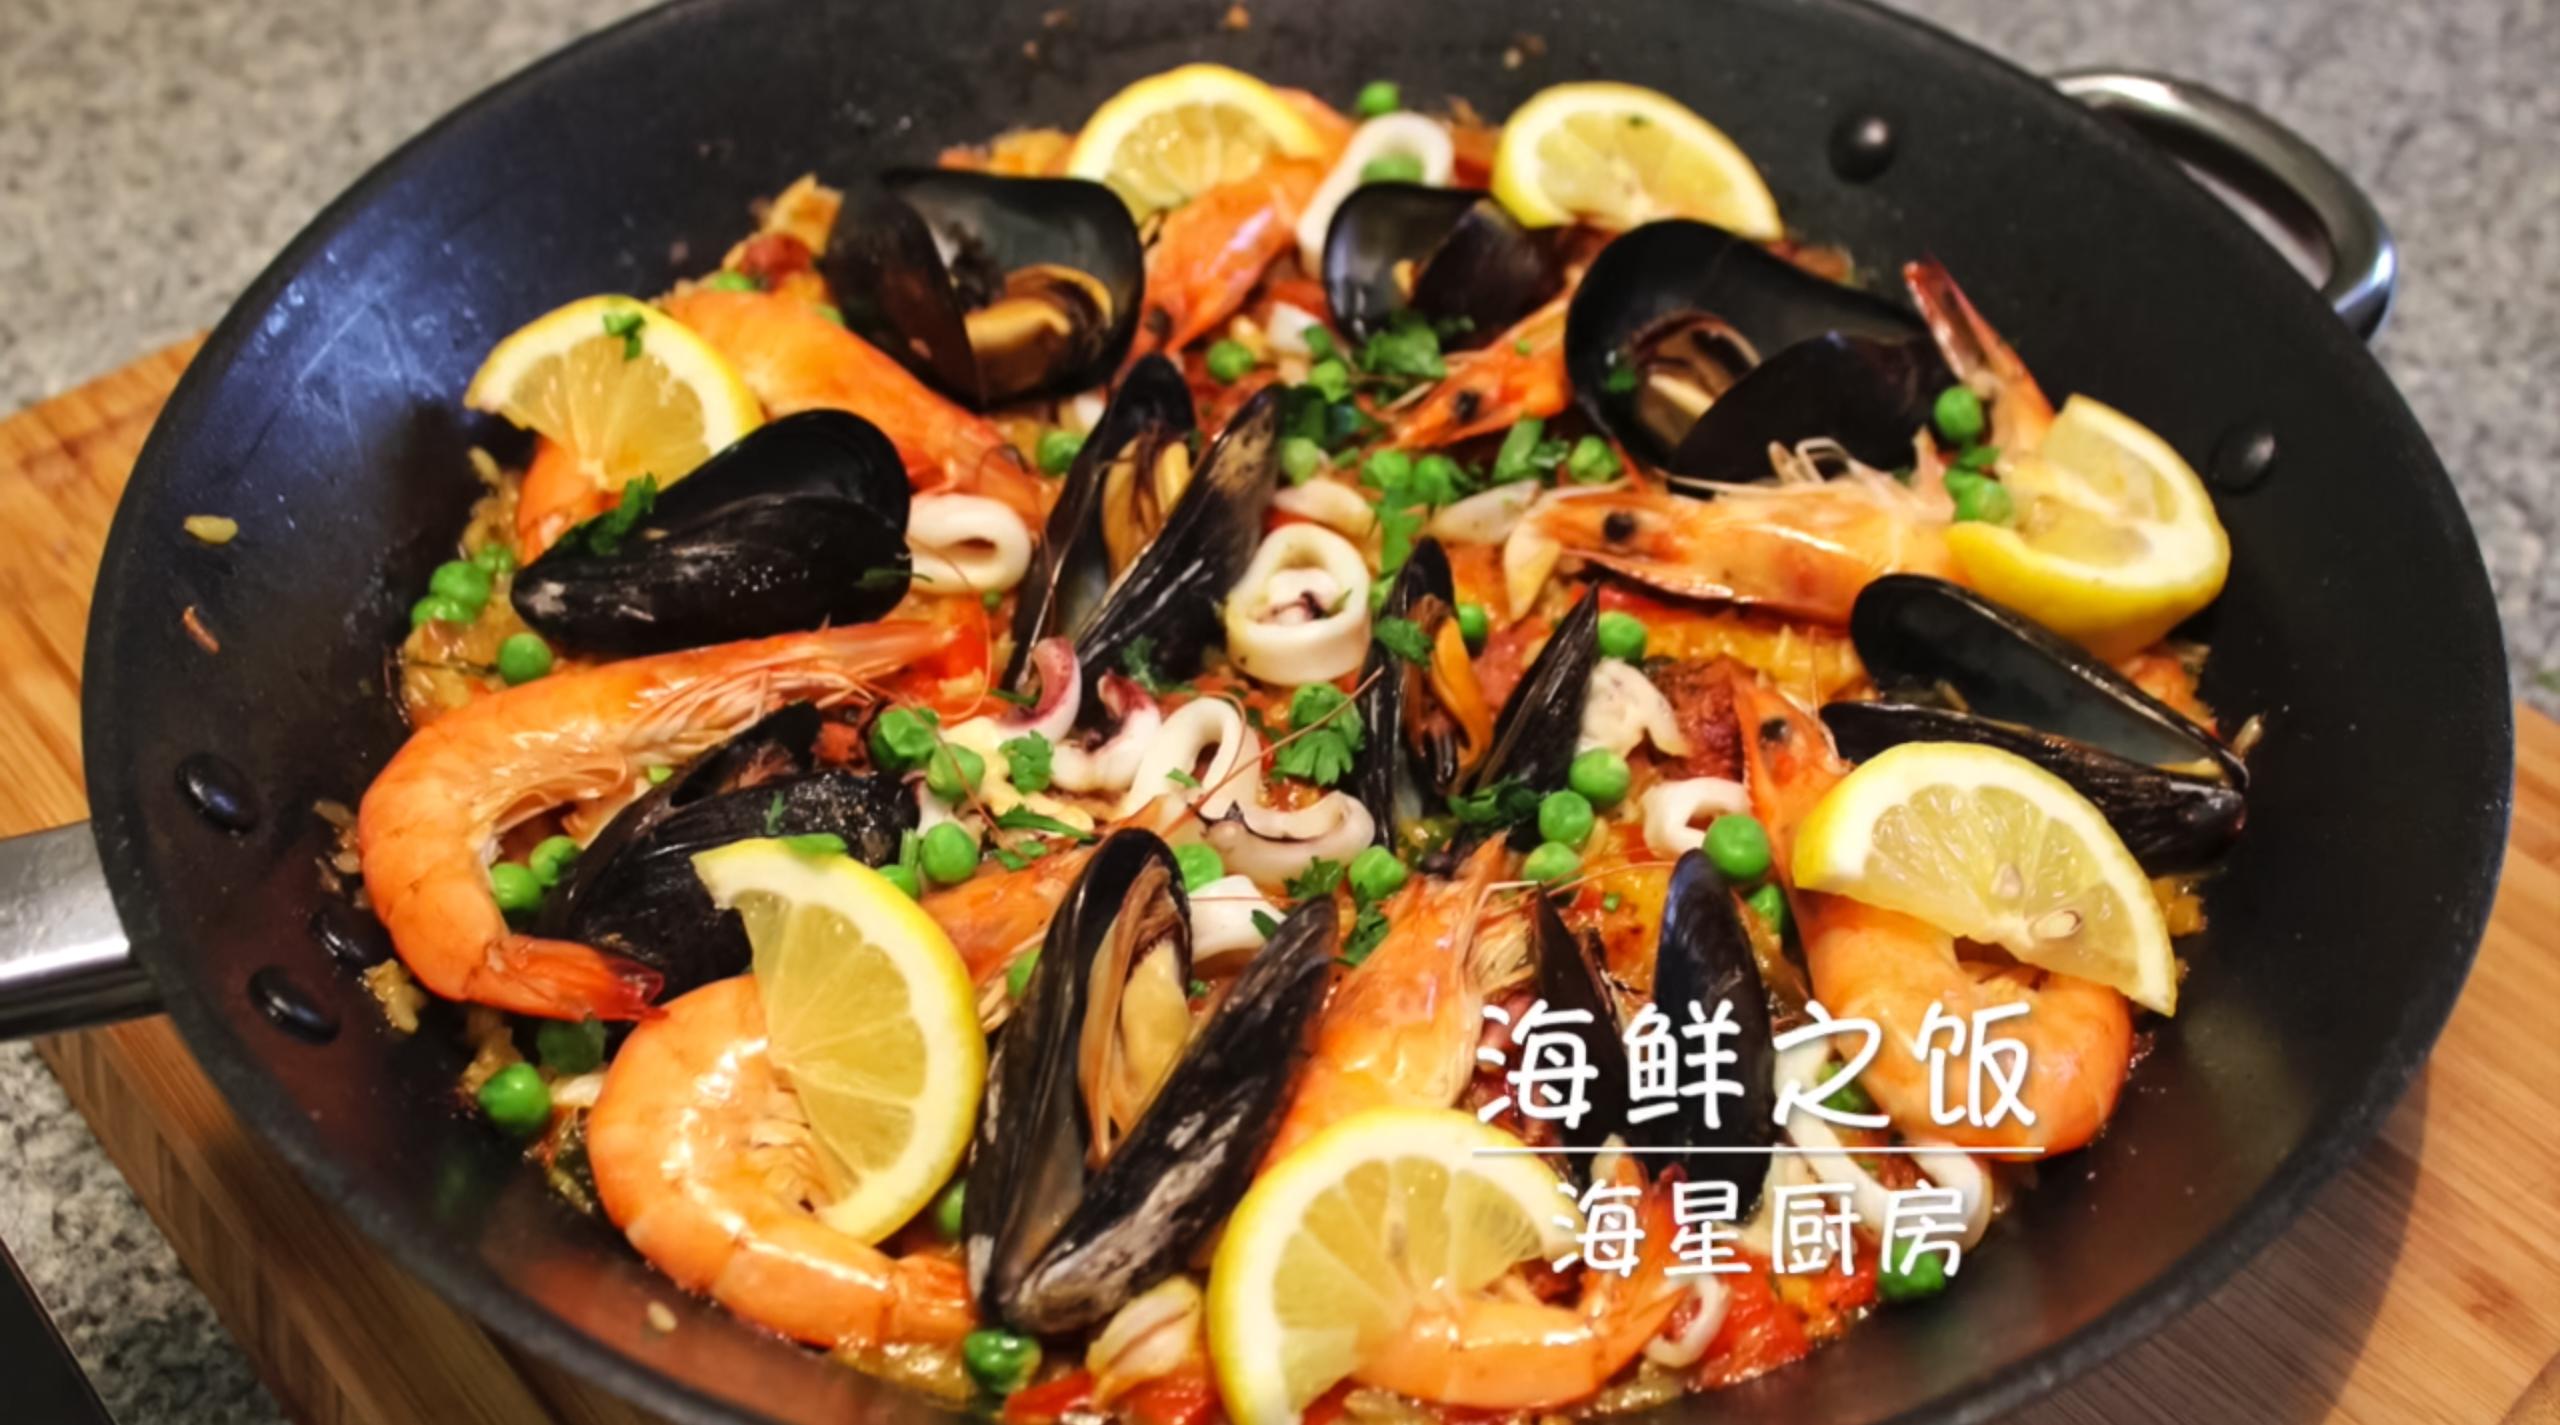 Yummy Seafood Paella